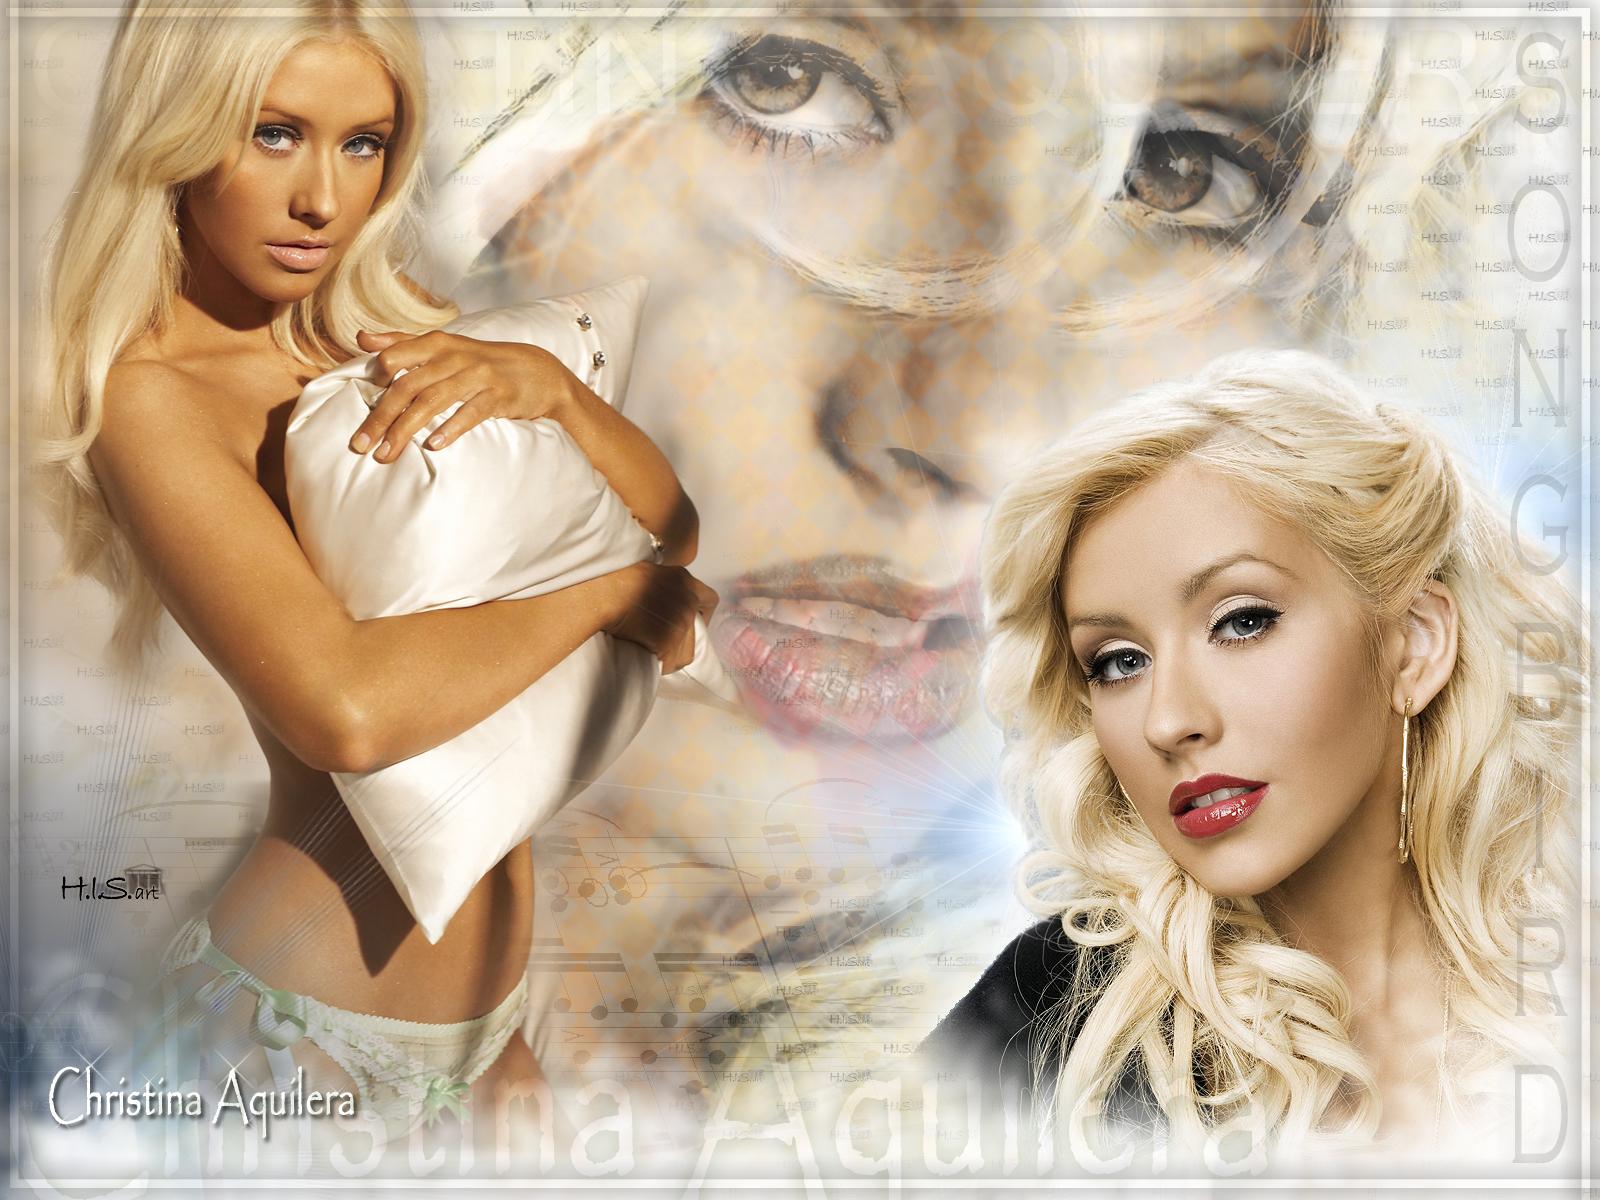 http://3.bp.blogspot.com/-hLEkXrygKWA/TytFHLl2wrI/AAAAAAAAAho/tRsJNNlKVWE/s1600/Christina-Aguilera-hd-Wallpapers.jpg